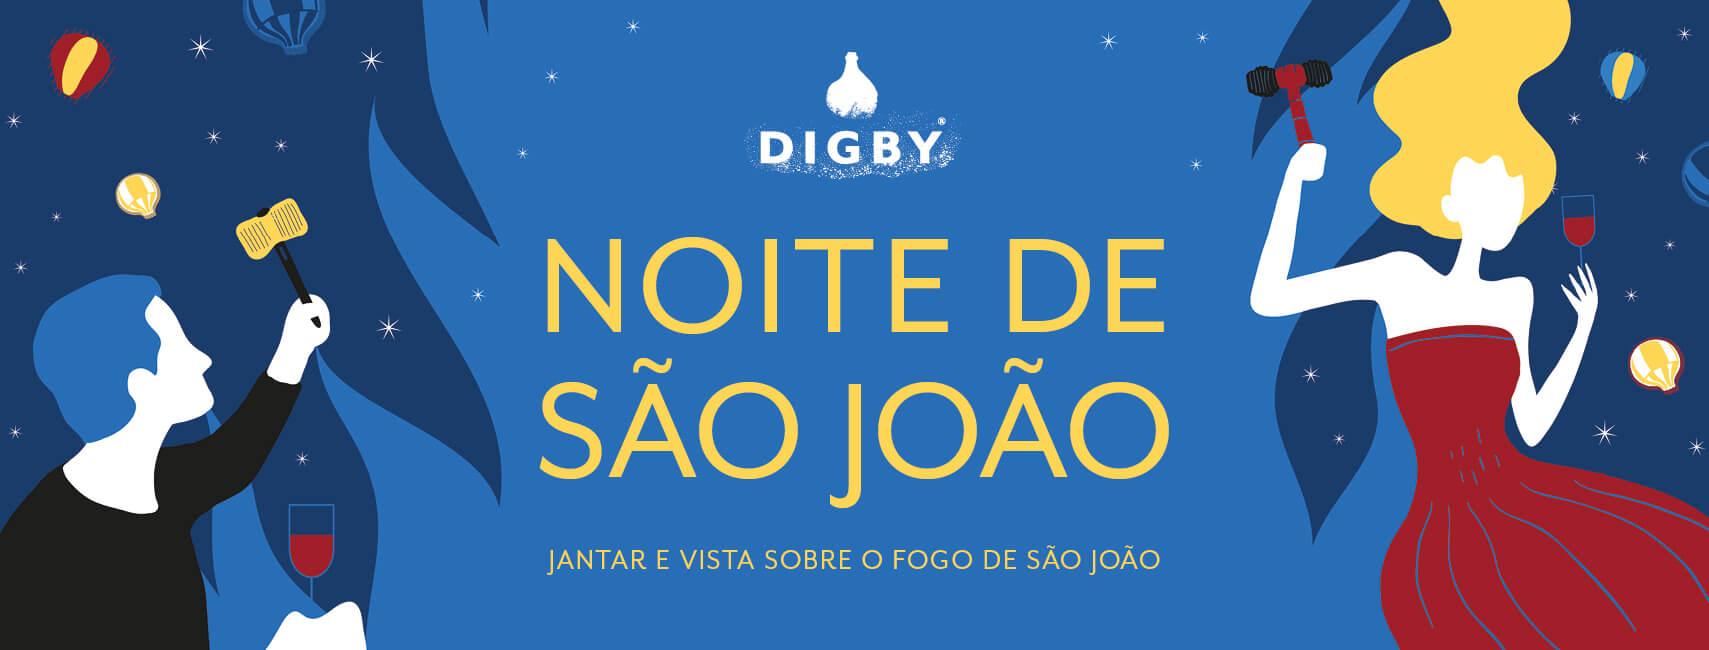 2018_06_Sao Joao_FB Cover